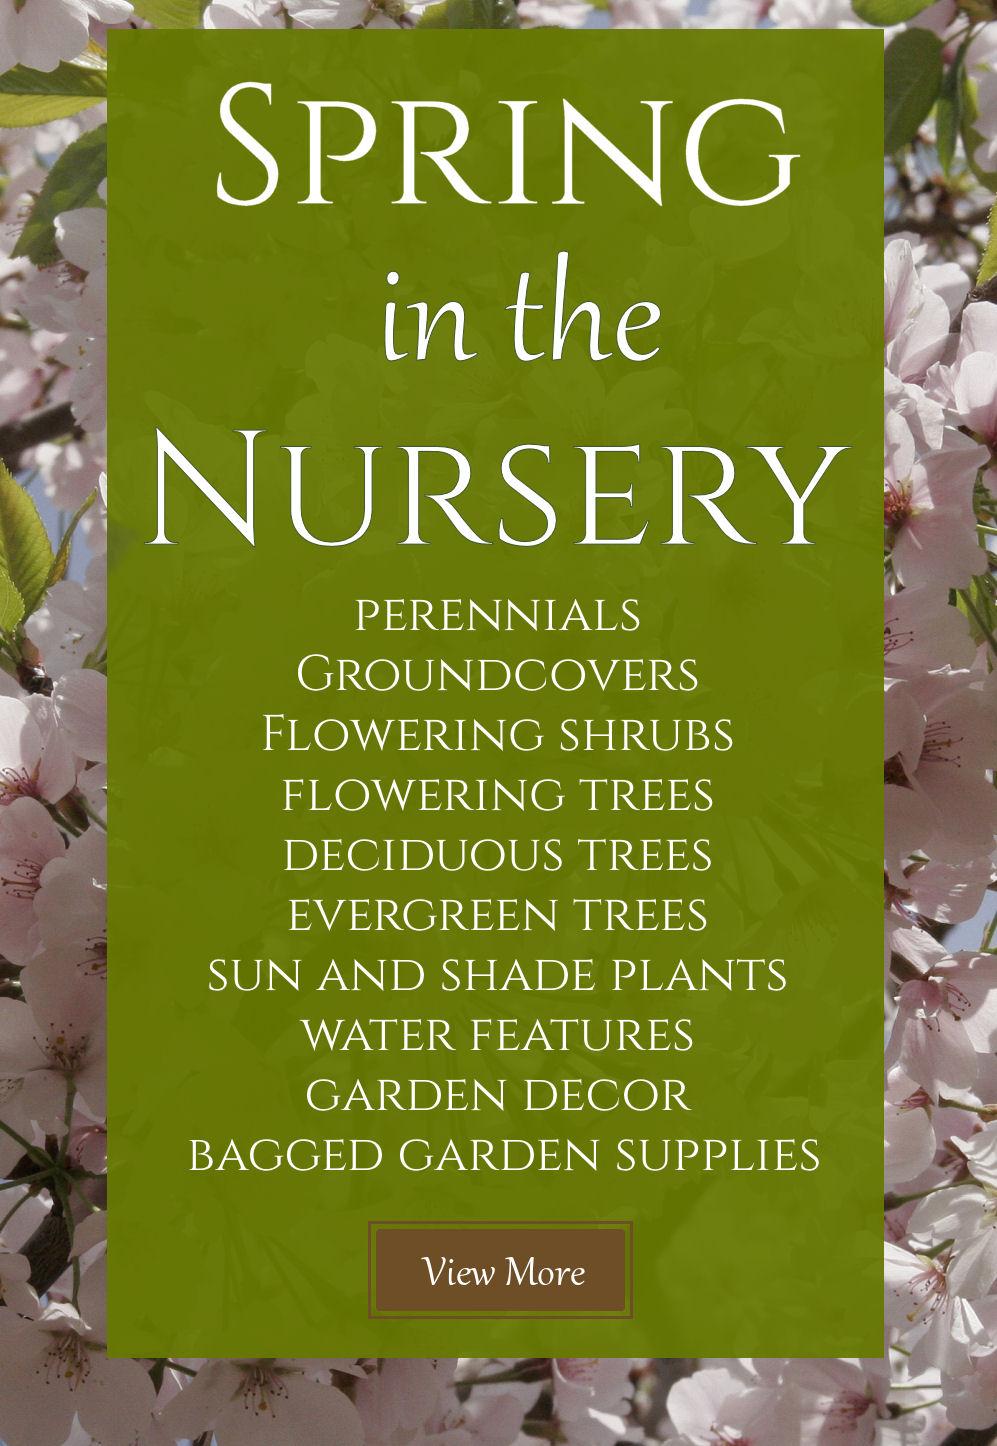 Kinsey Family Plant Nursery Garden Center